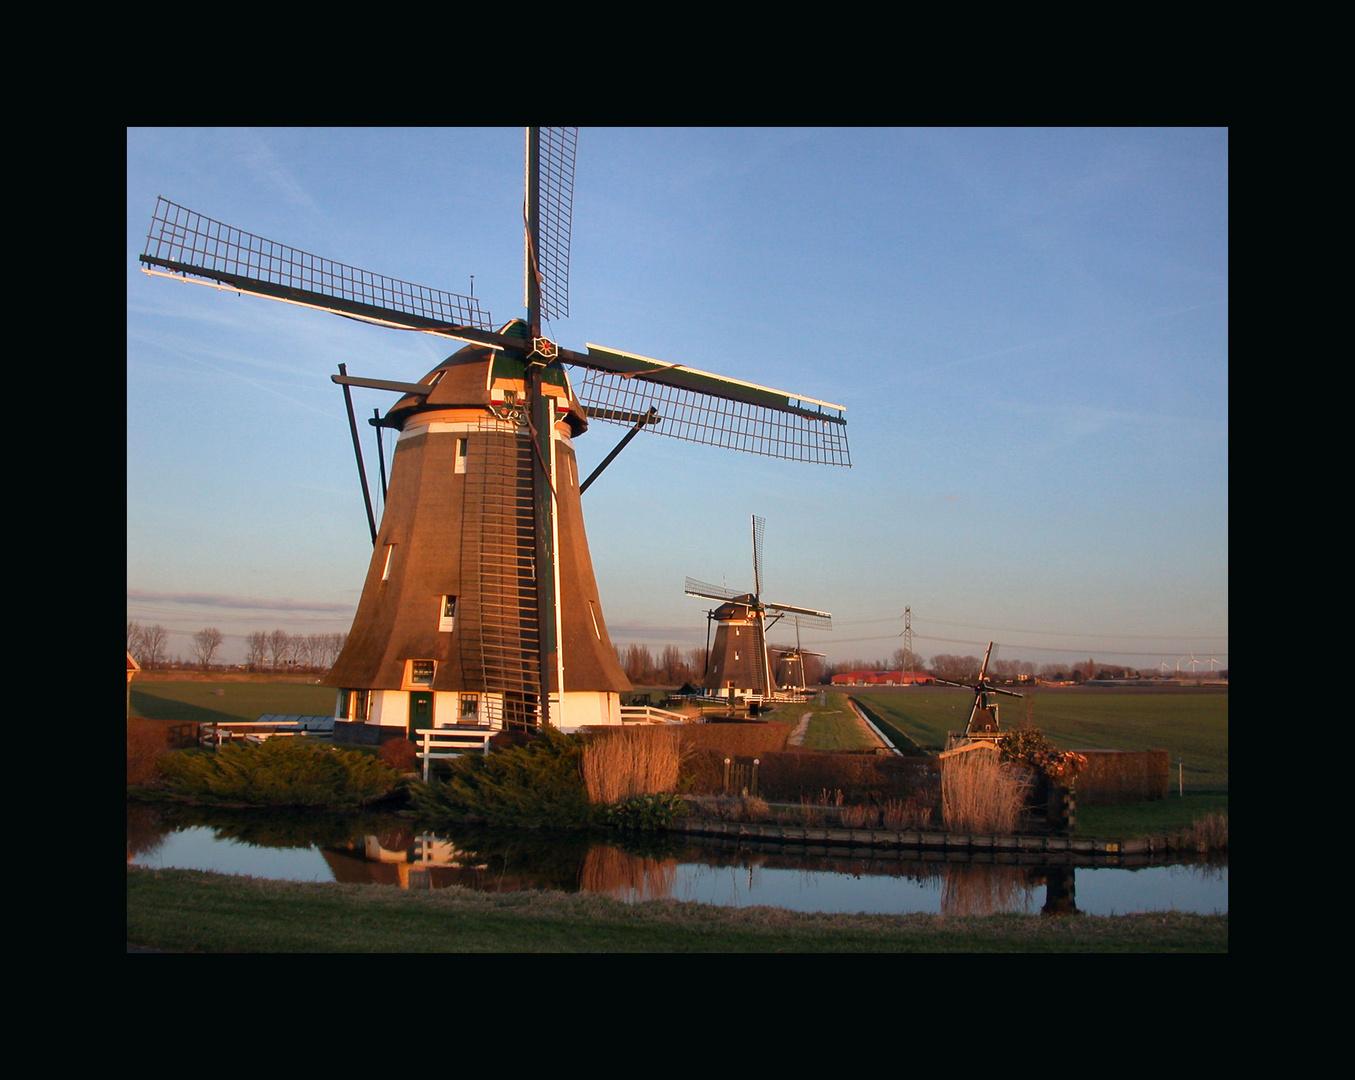 Mills1